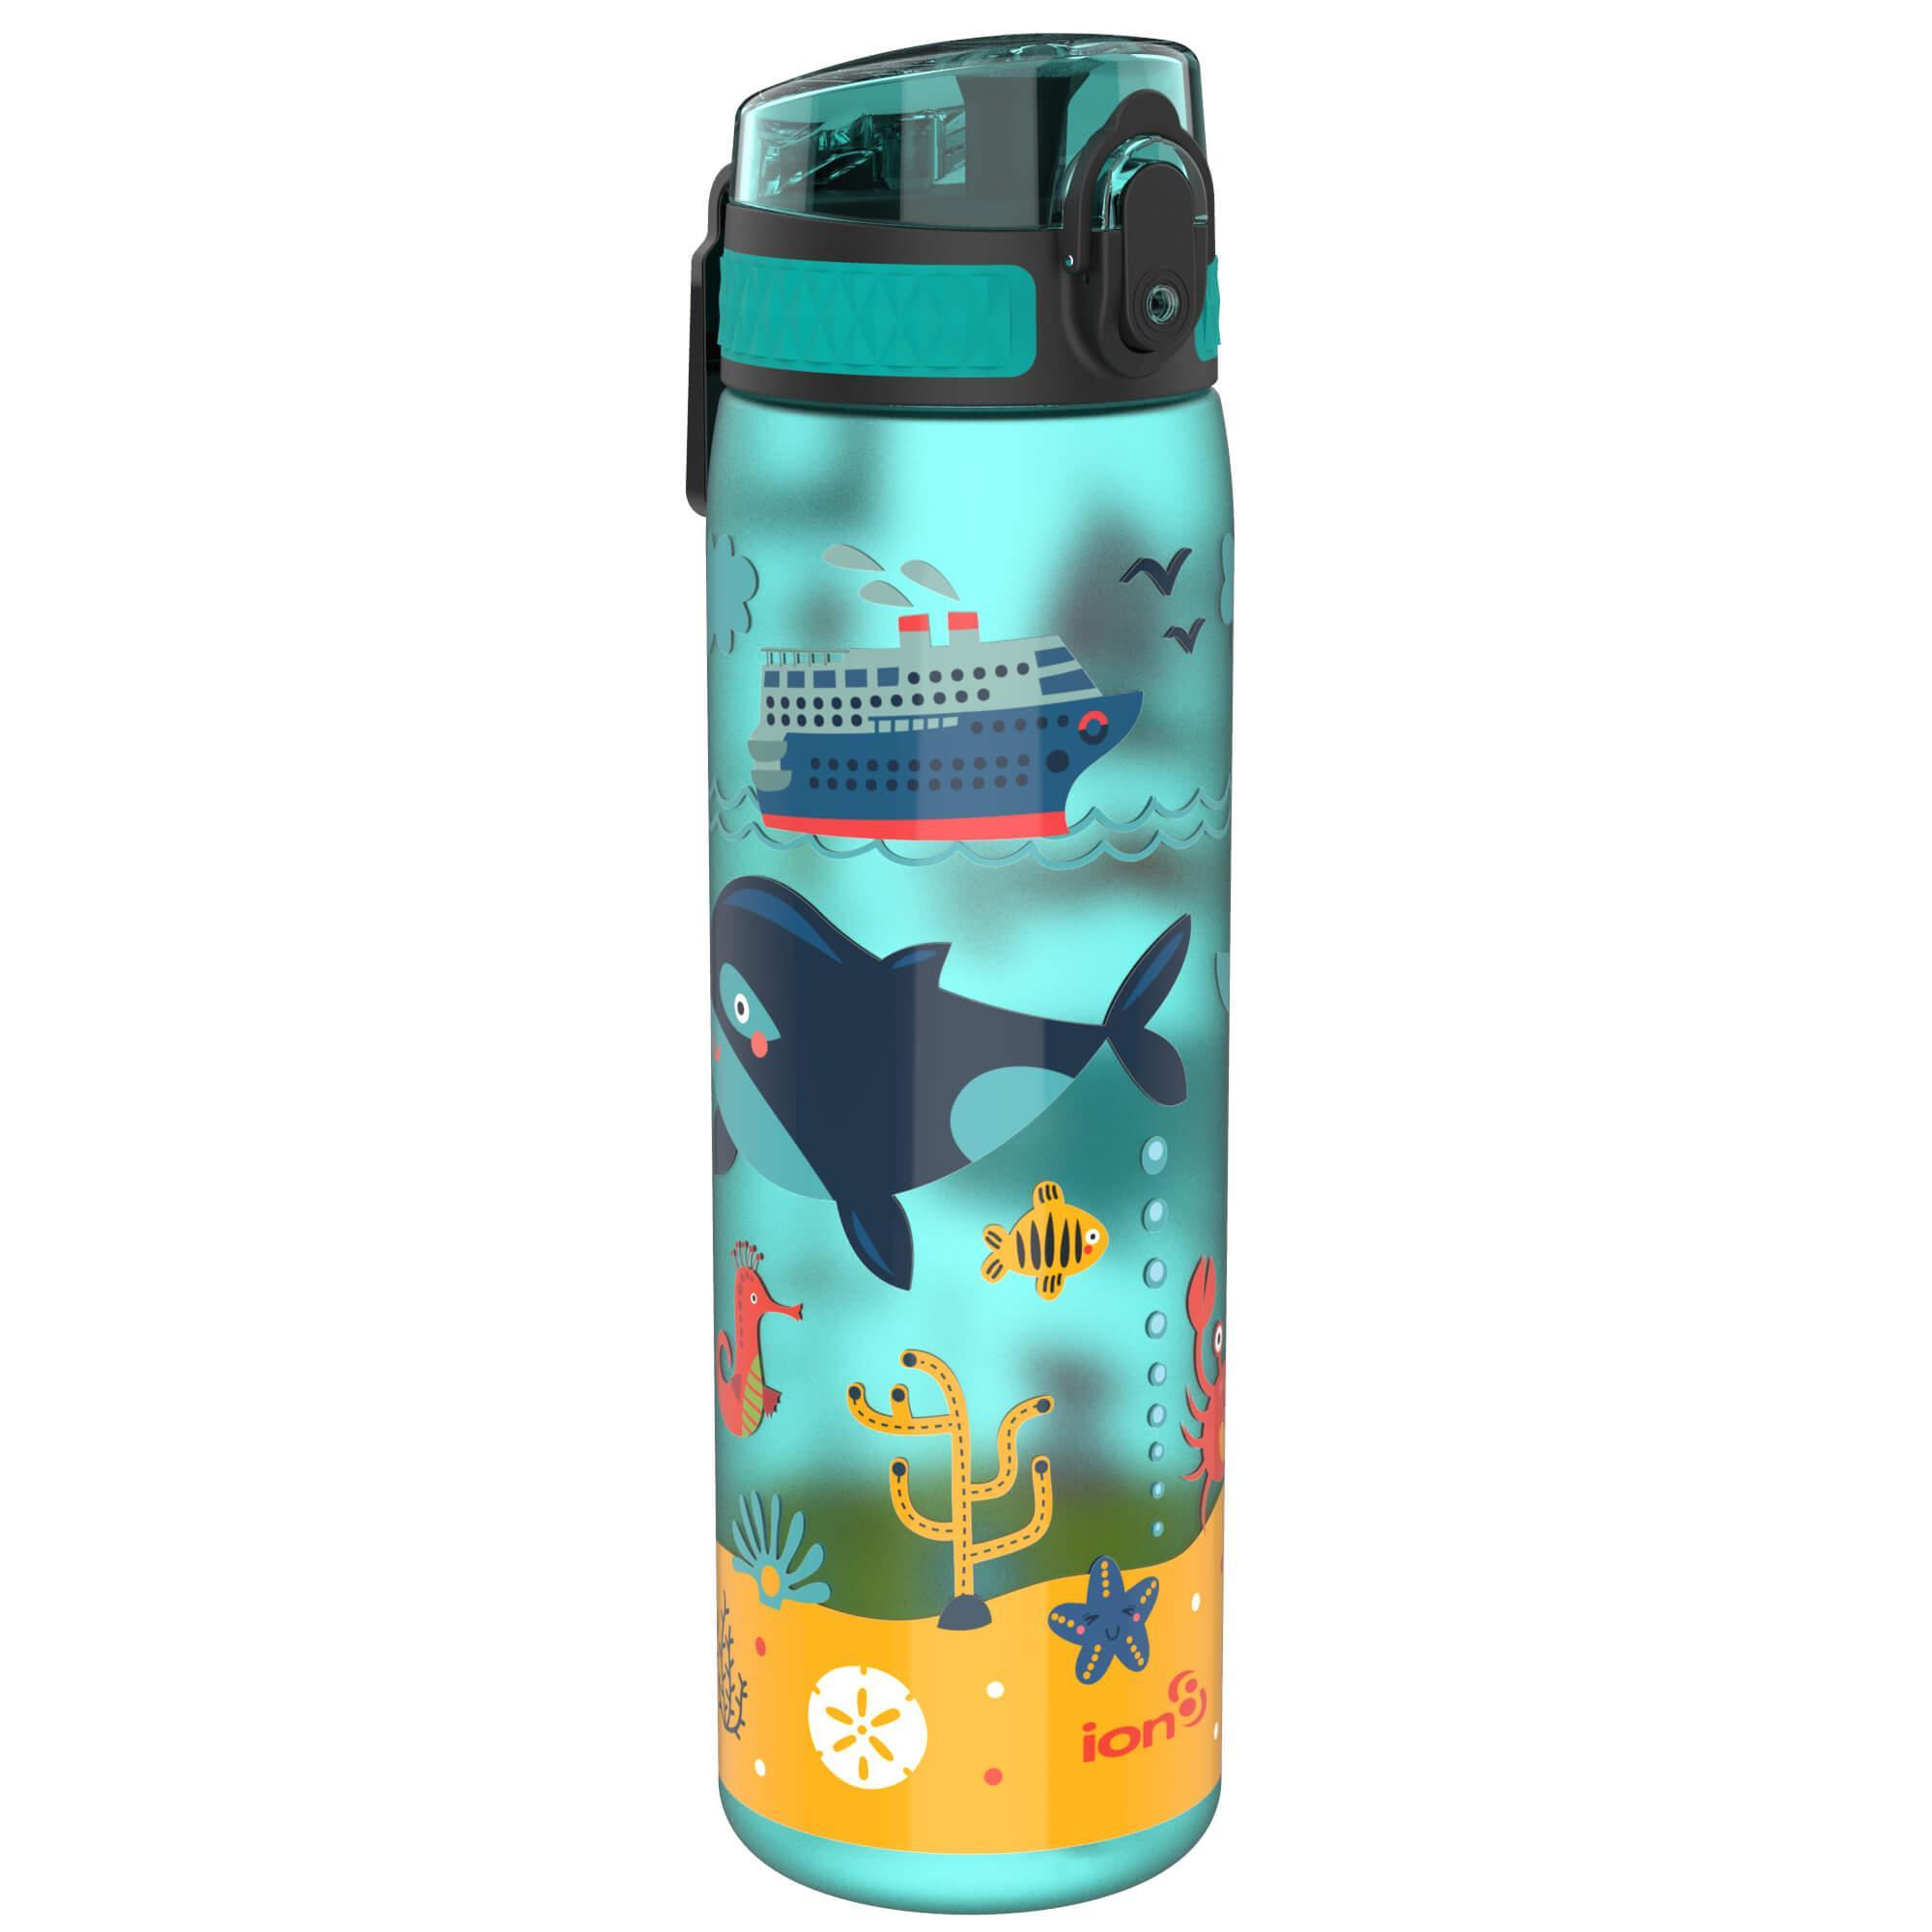 BPA Free 500ml 18oz Frosted Grey Ion8 Leak Proof Slim Water Bottle